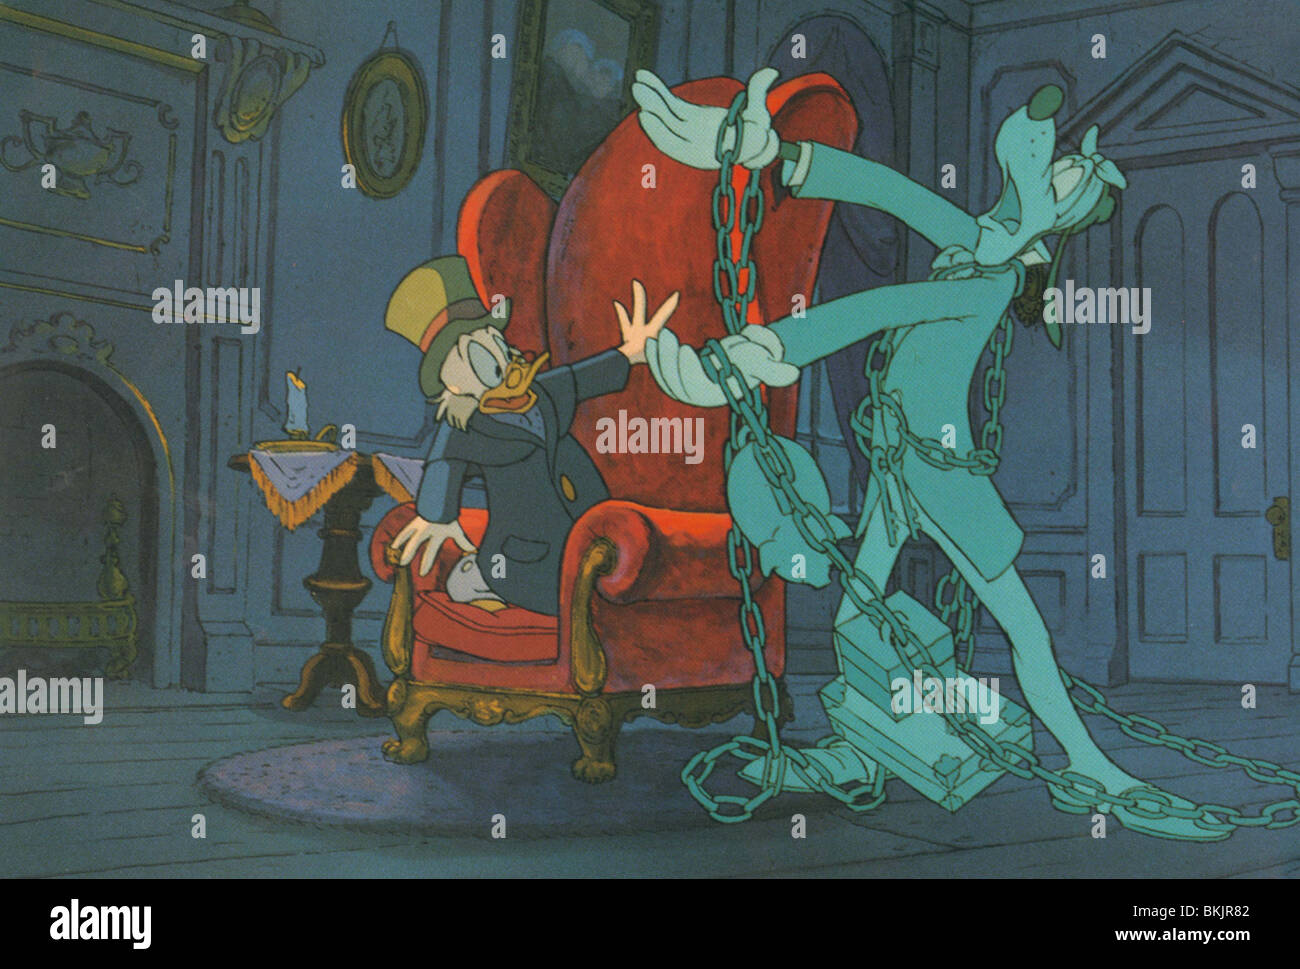 Mickeys Christmas Carol 1983 Scrooge Goofy Mkcc 003foh Stock